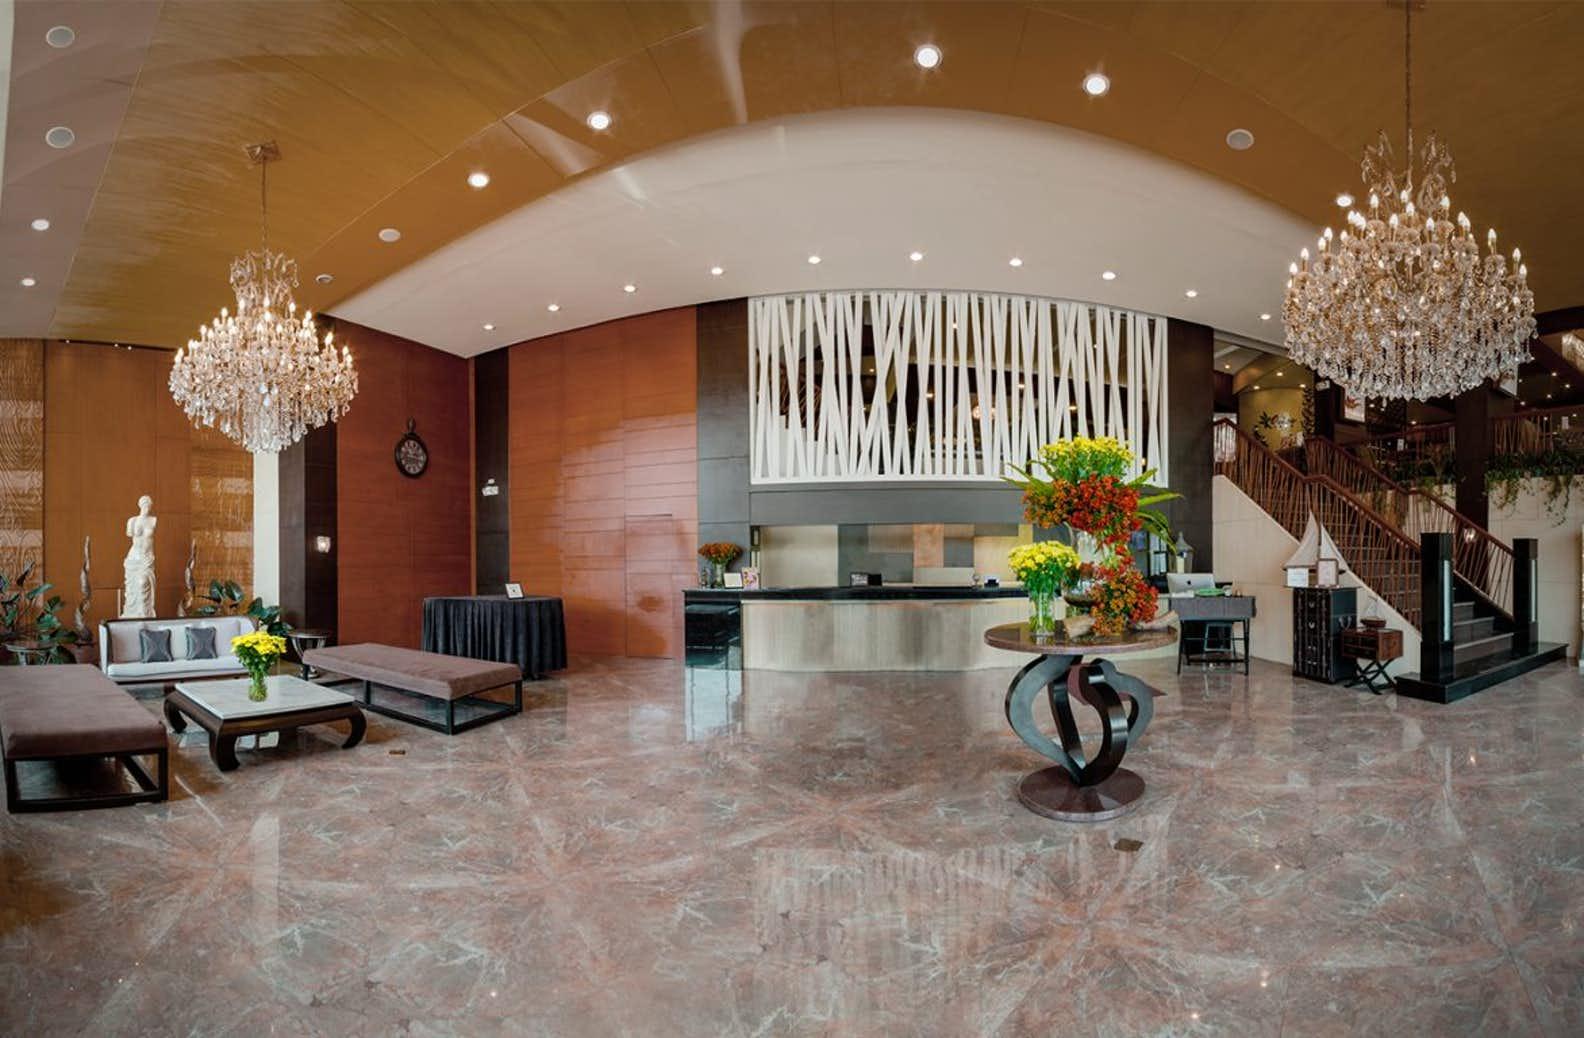 Reception of Venus Parkview Hotel in Baguio